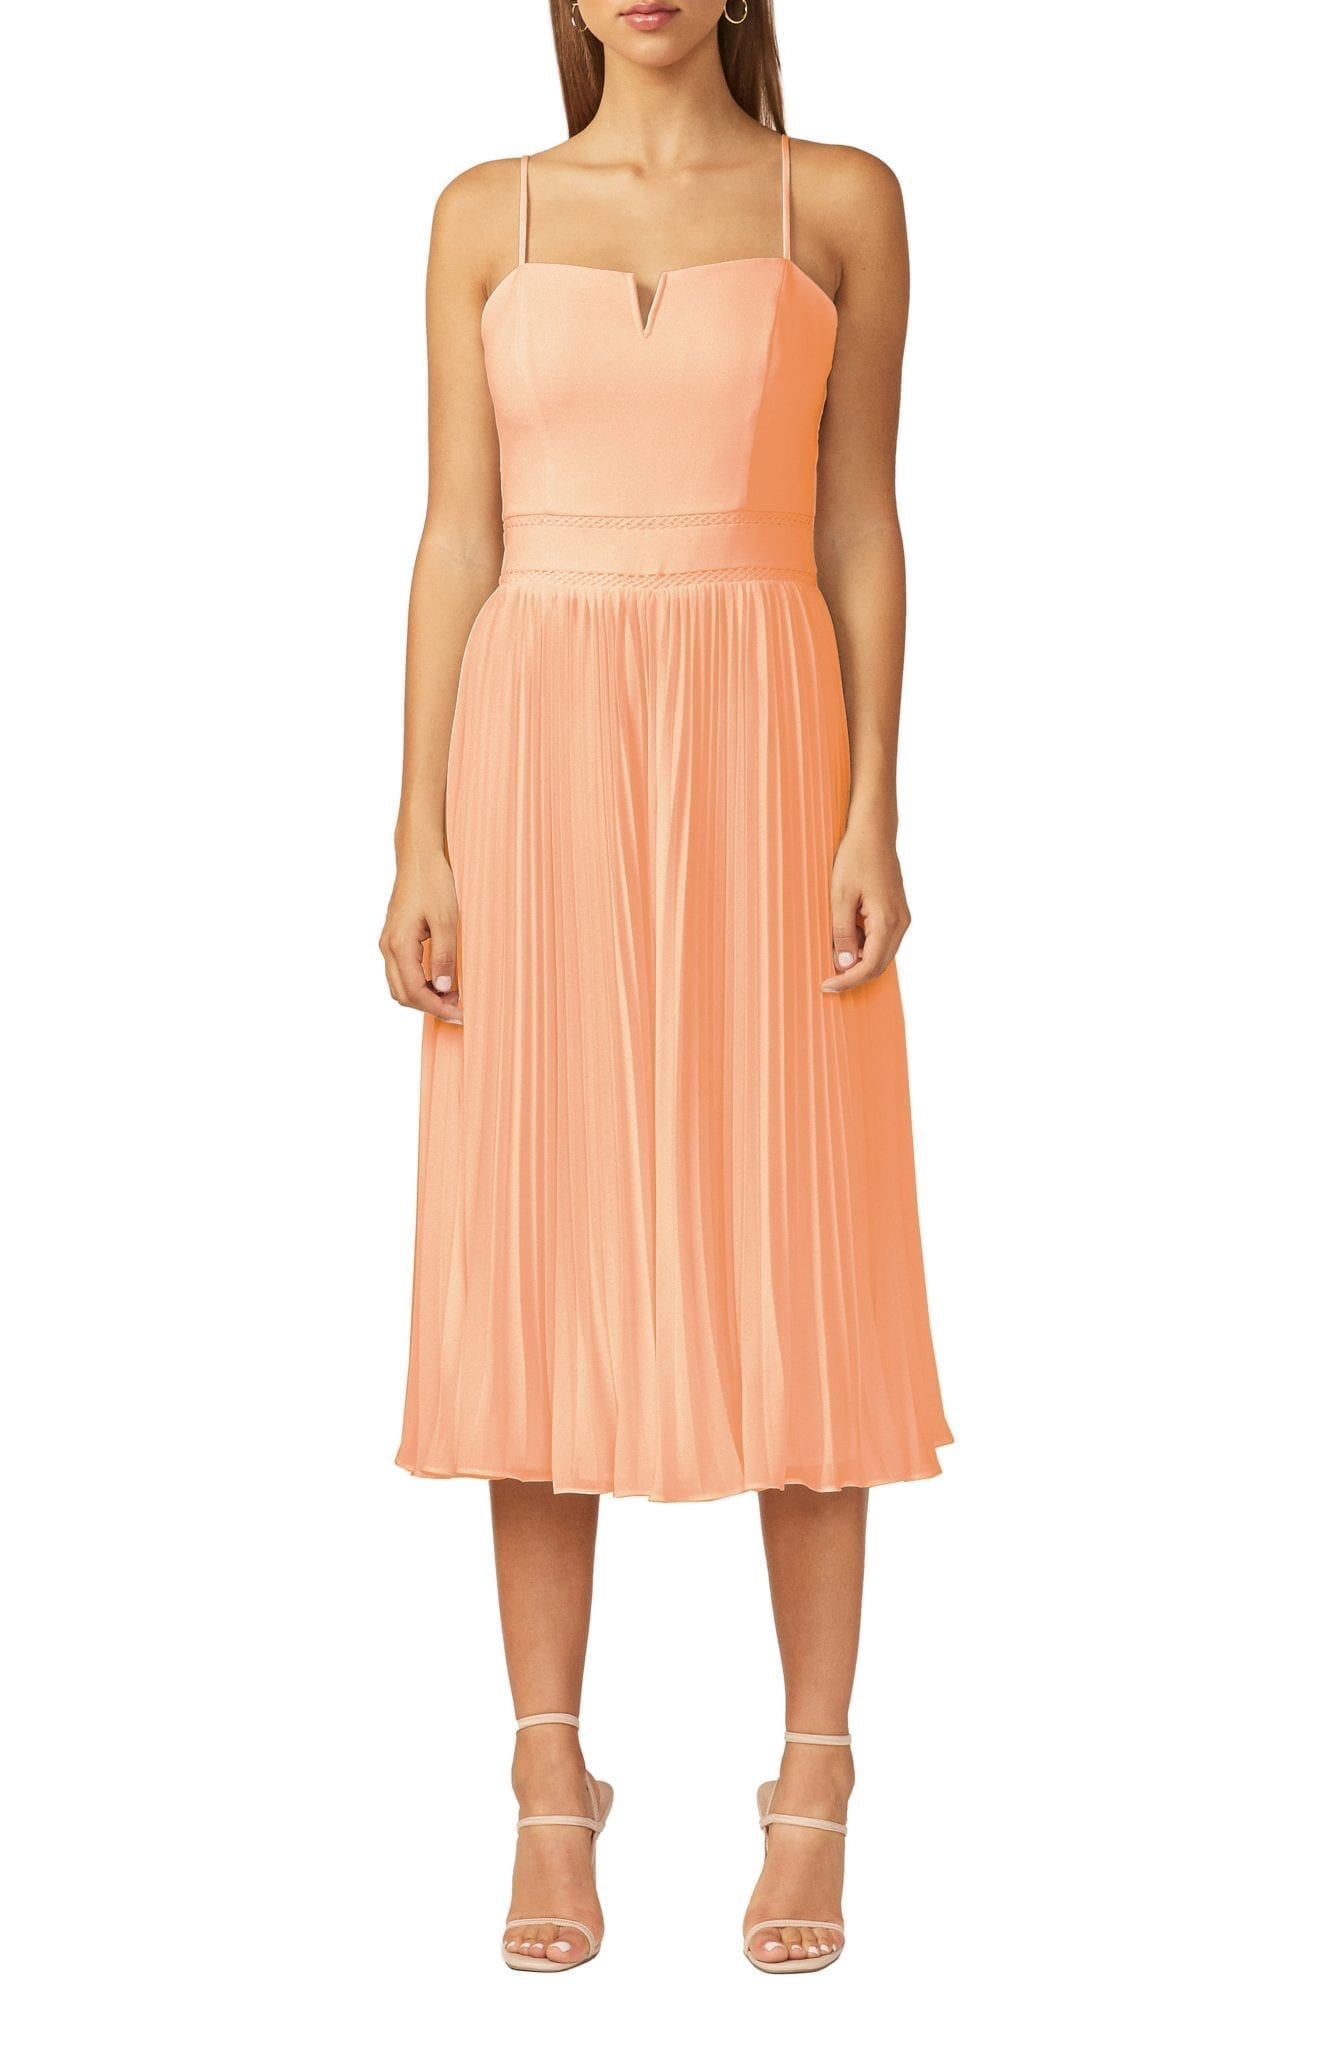 ADELYN RAE Charli Pleated Midi Dress